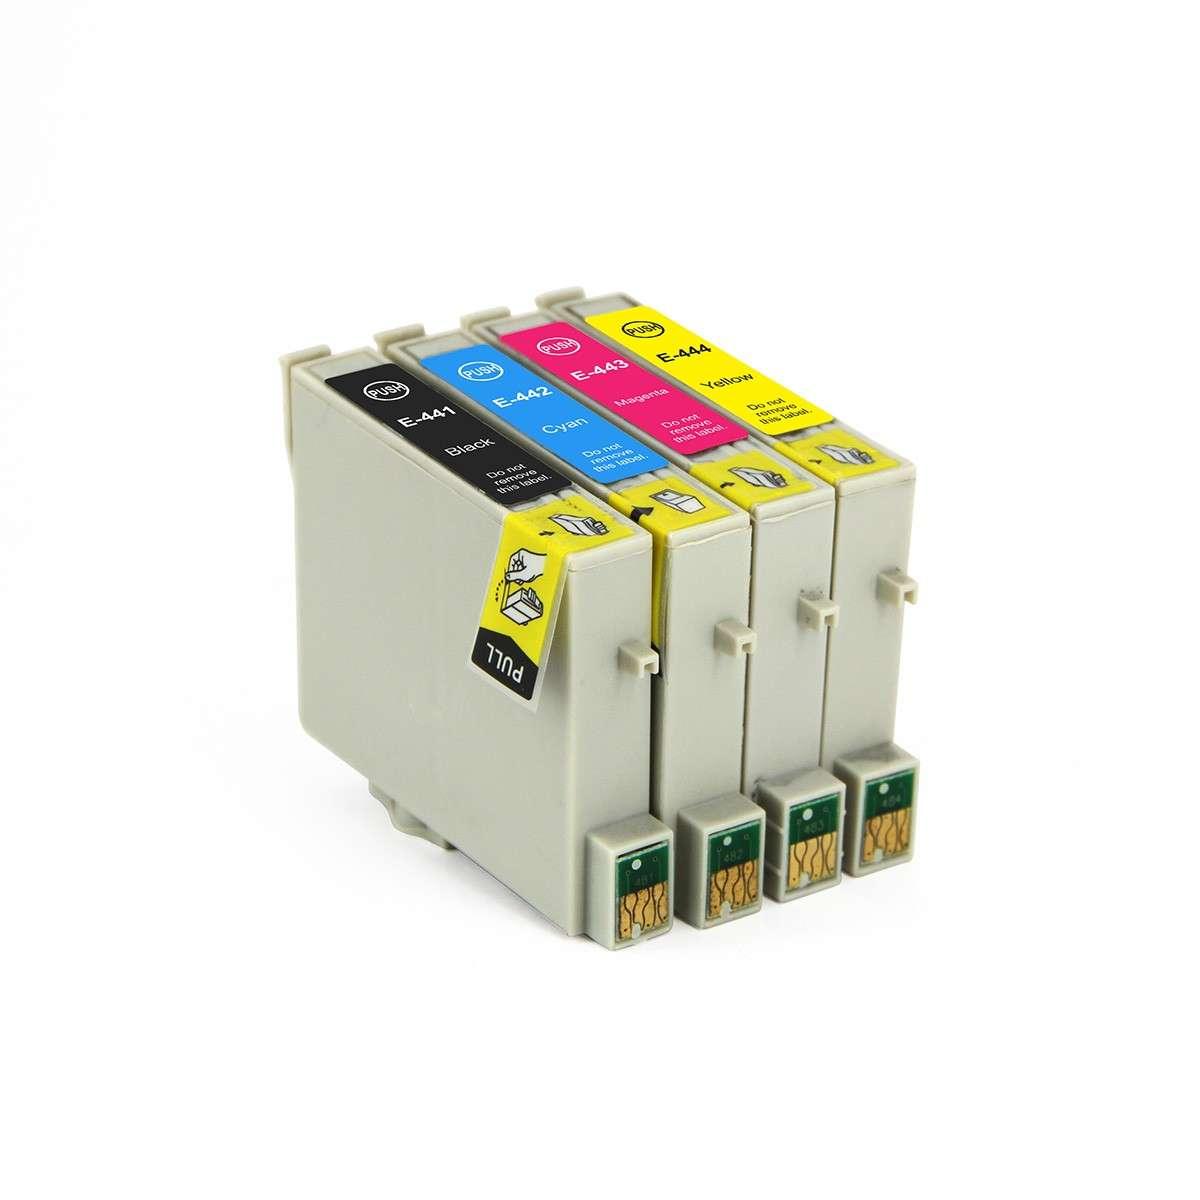 Epson Multipack Ink Cartridges (T0441-T0444)